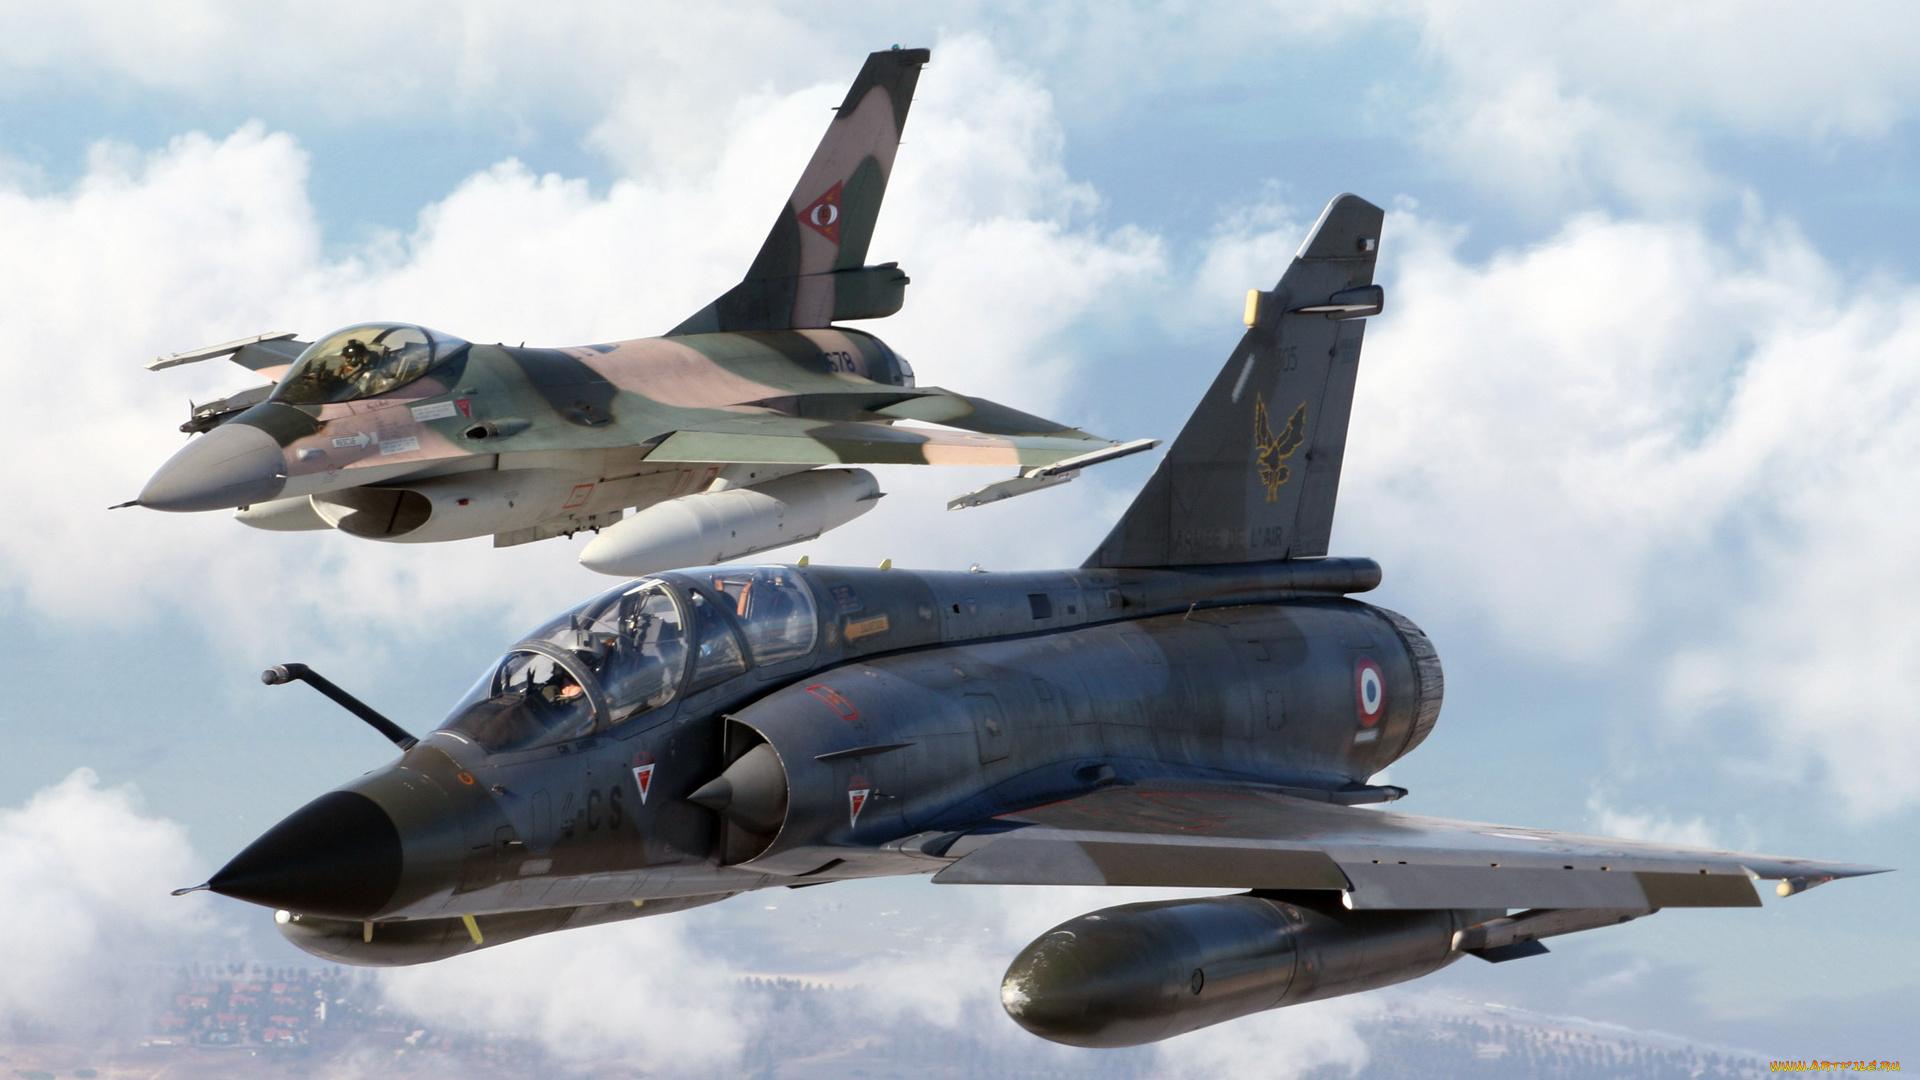 авиация самолет желтый F-16 Fighting Falcon  № 3755553 бесплатно